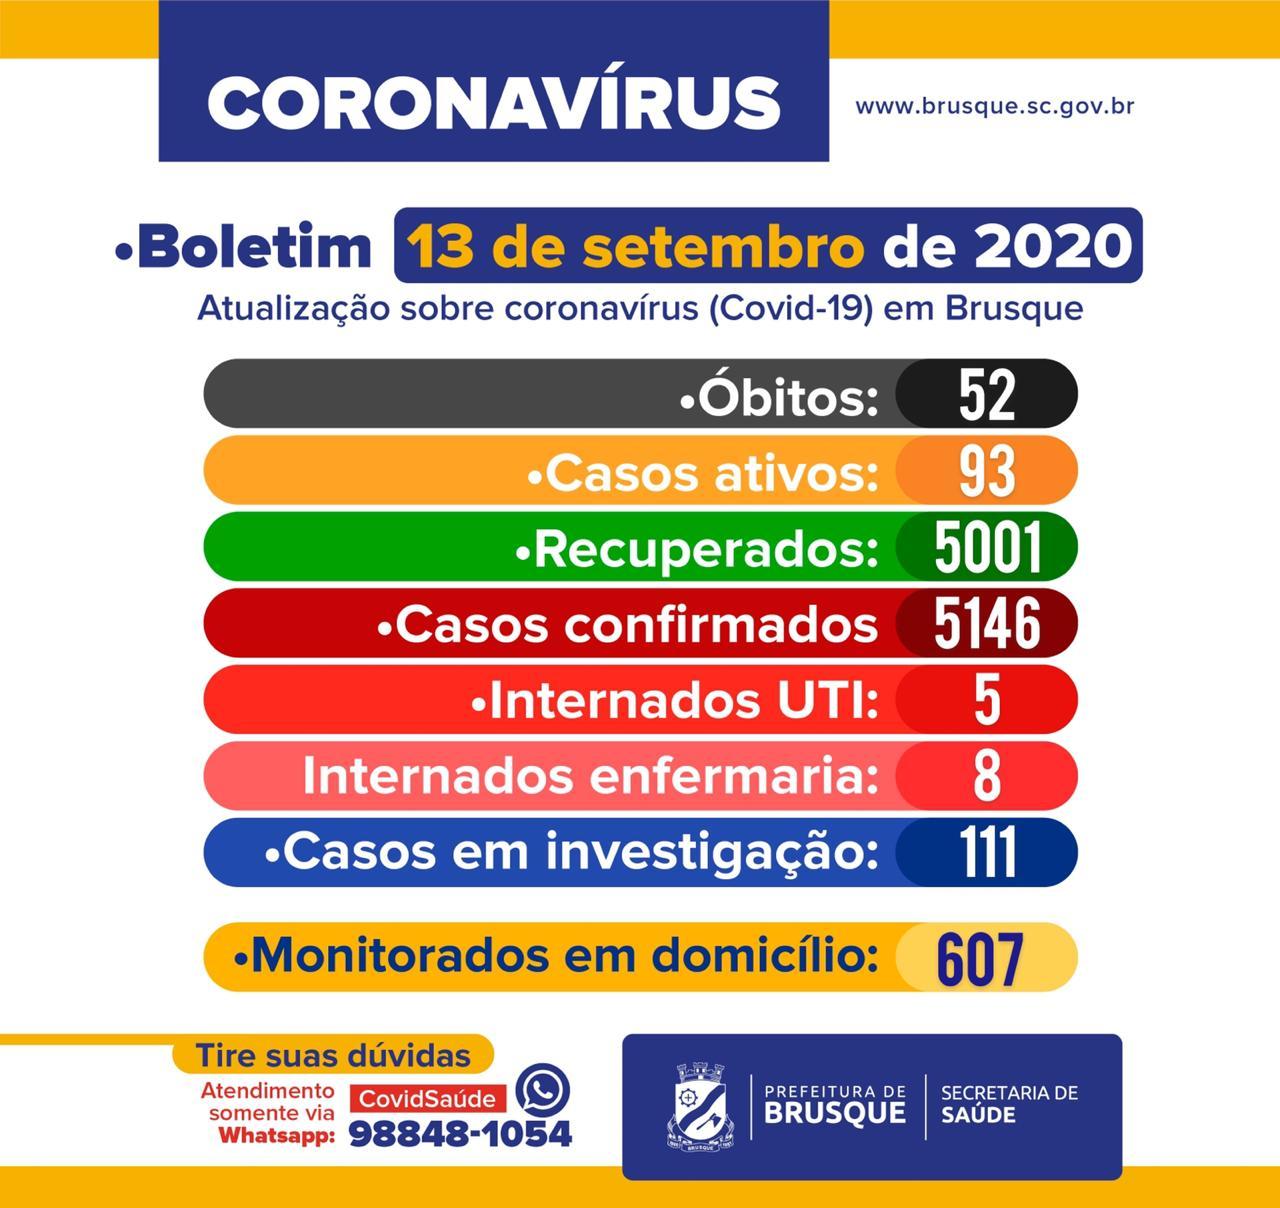 COVID-19: Boletim epidemiológico 13 de setembro